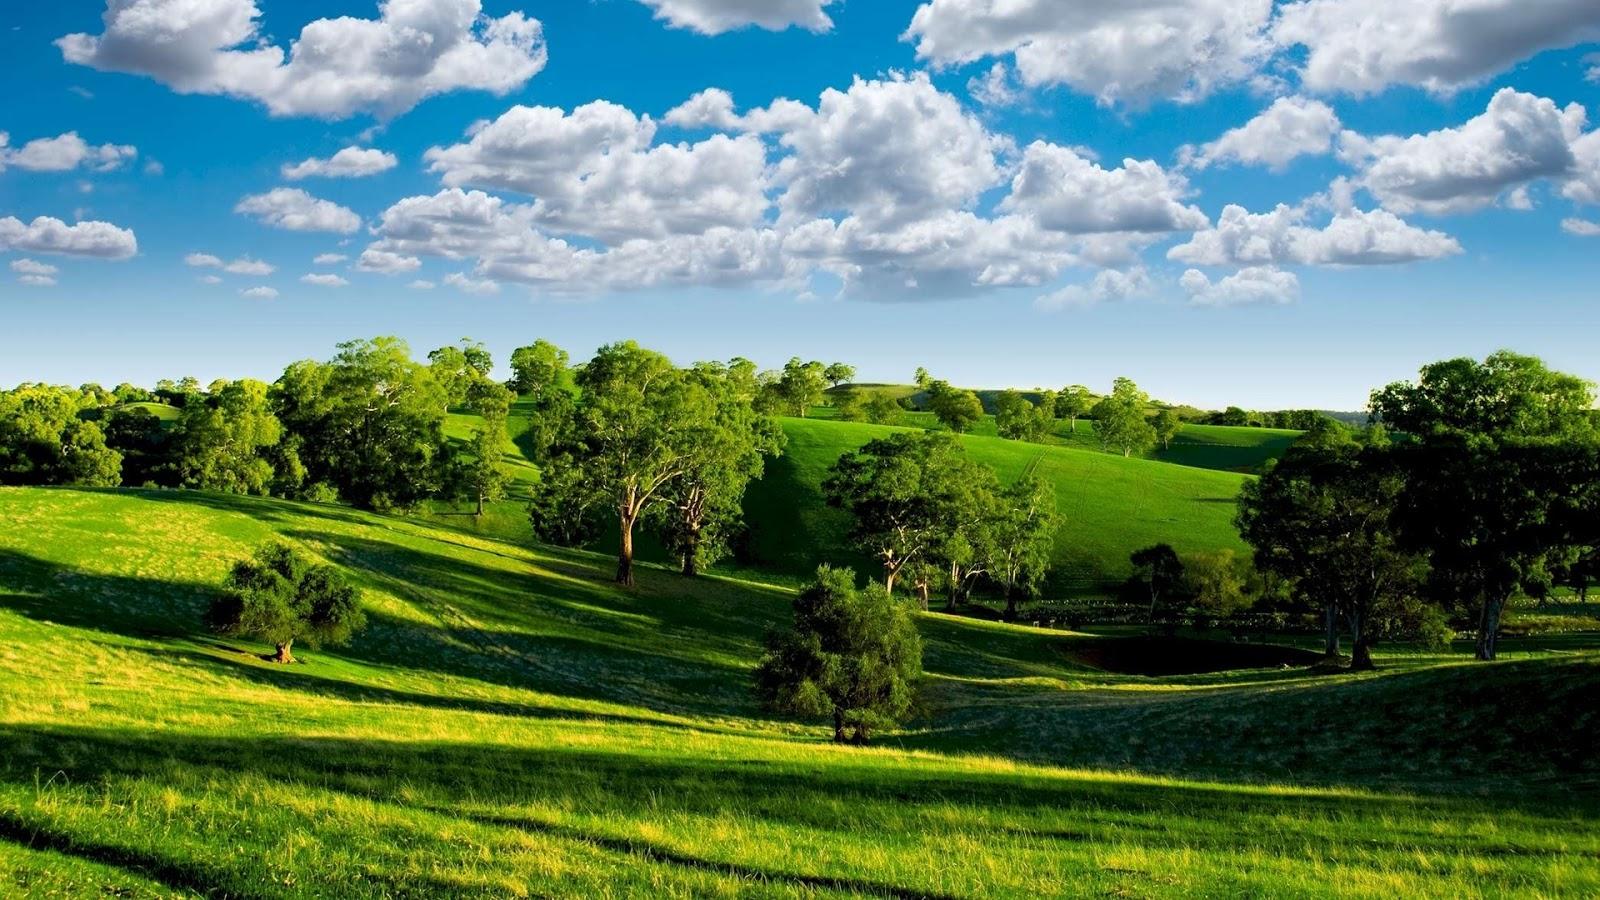 wallpapers scenery wallpaper landscape - photo #19